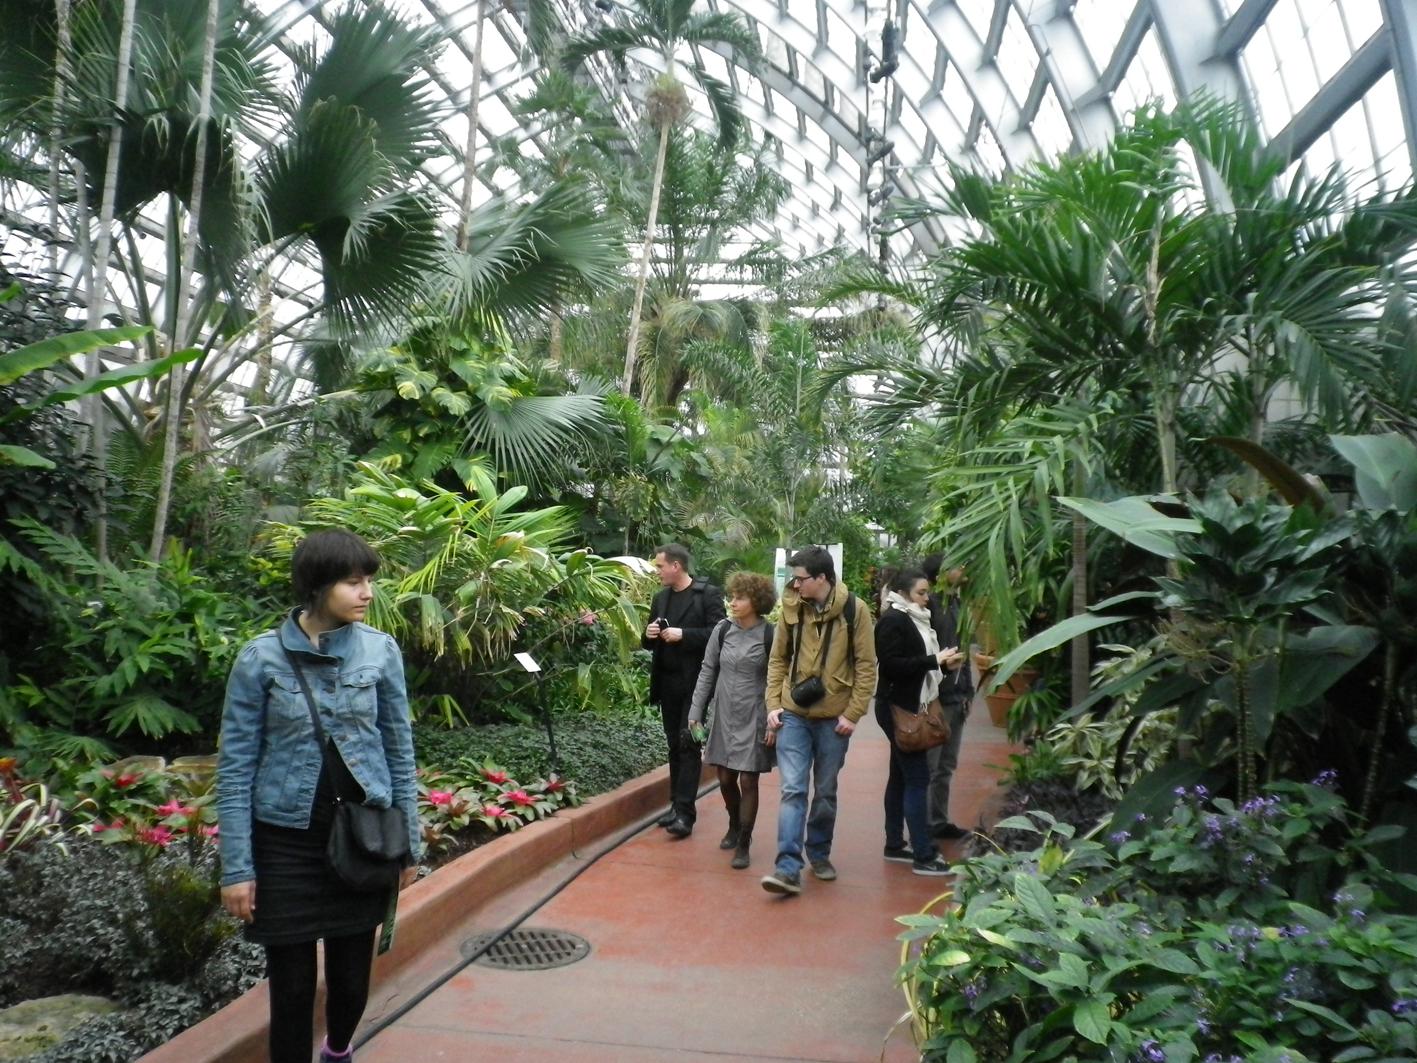 Garfield park conservatory2